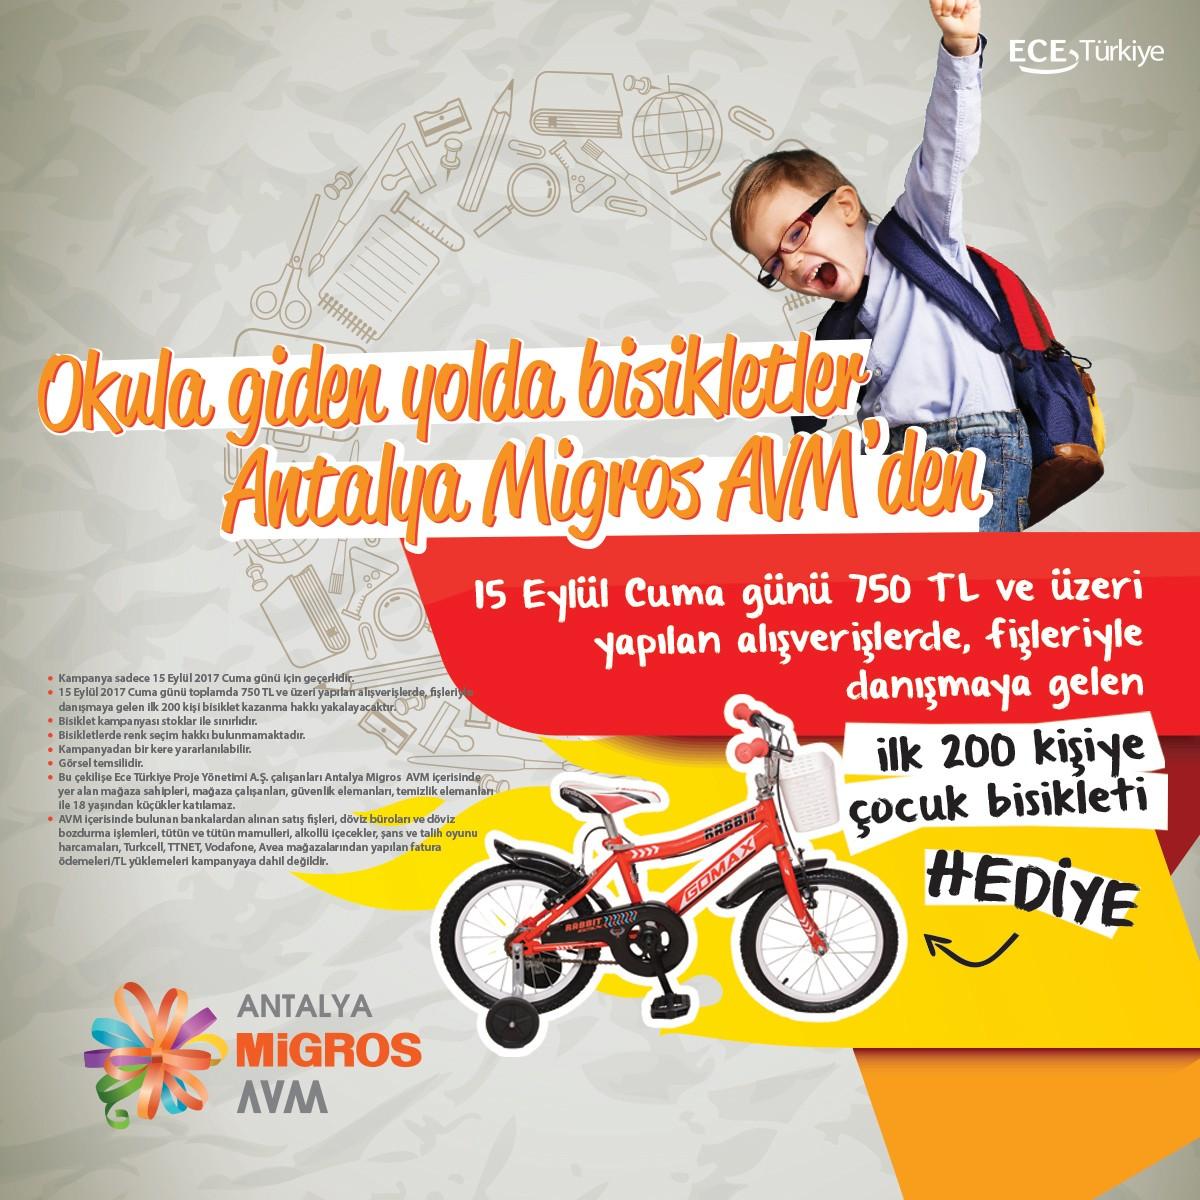 Okula giden yolda bisikletler Antalya Migros AVM'den!